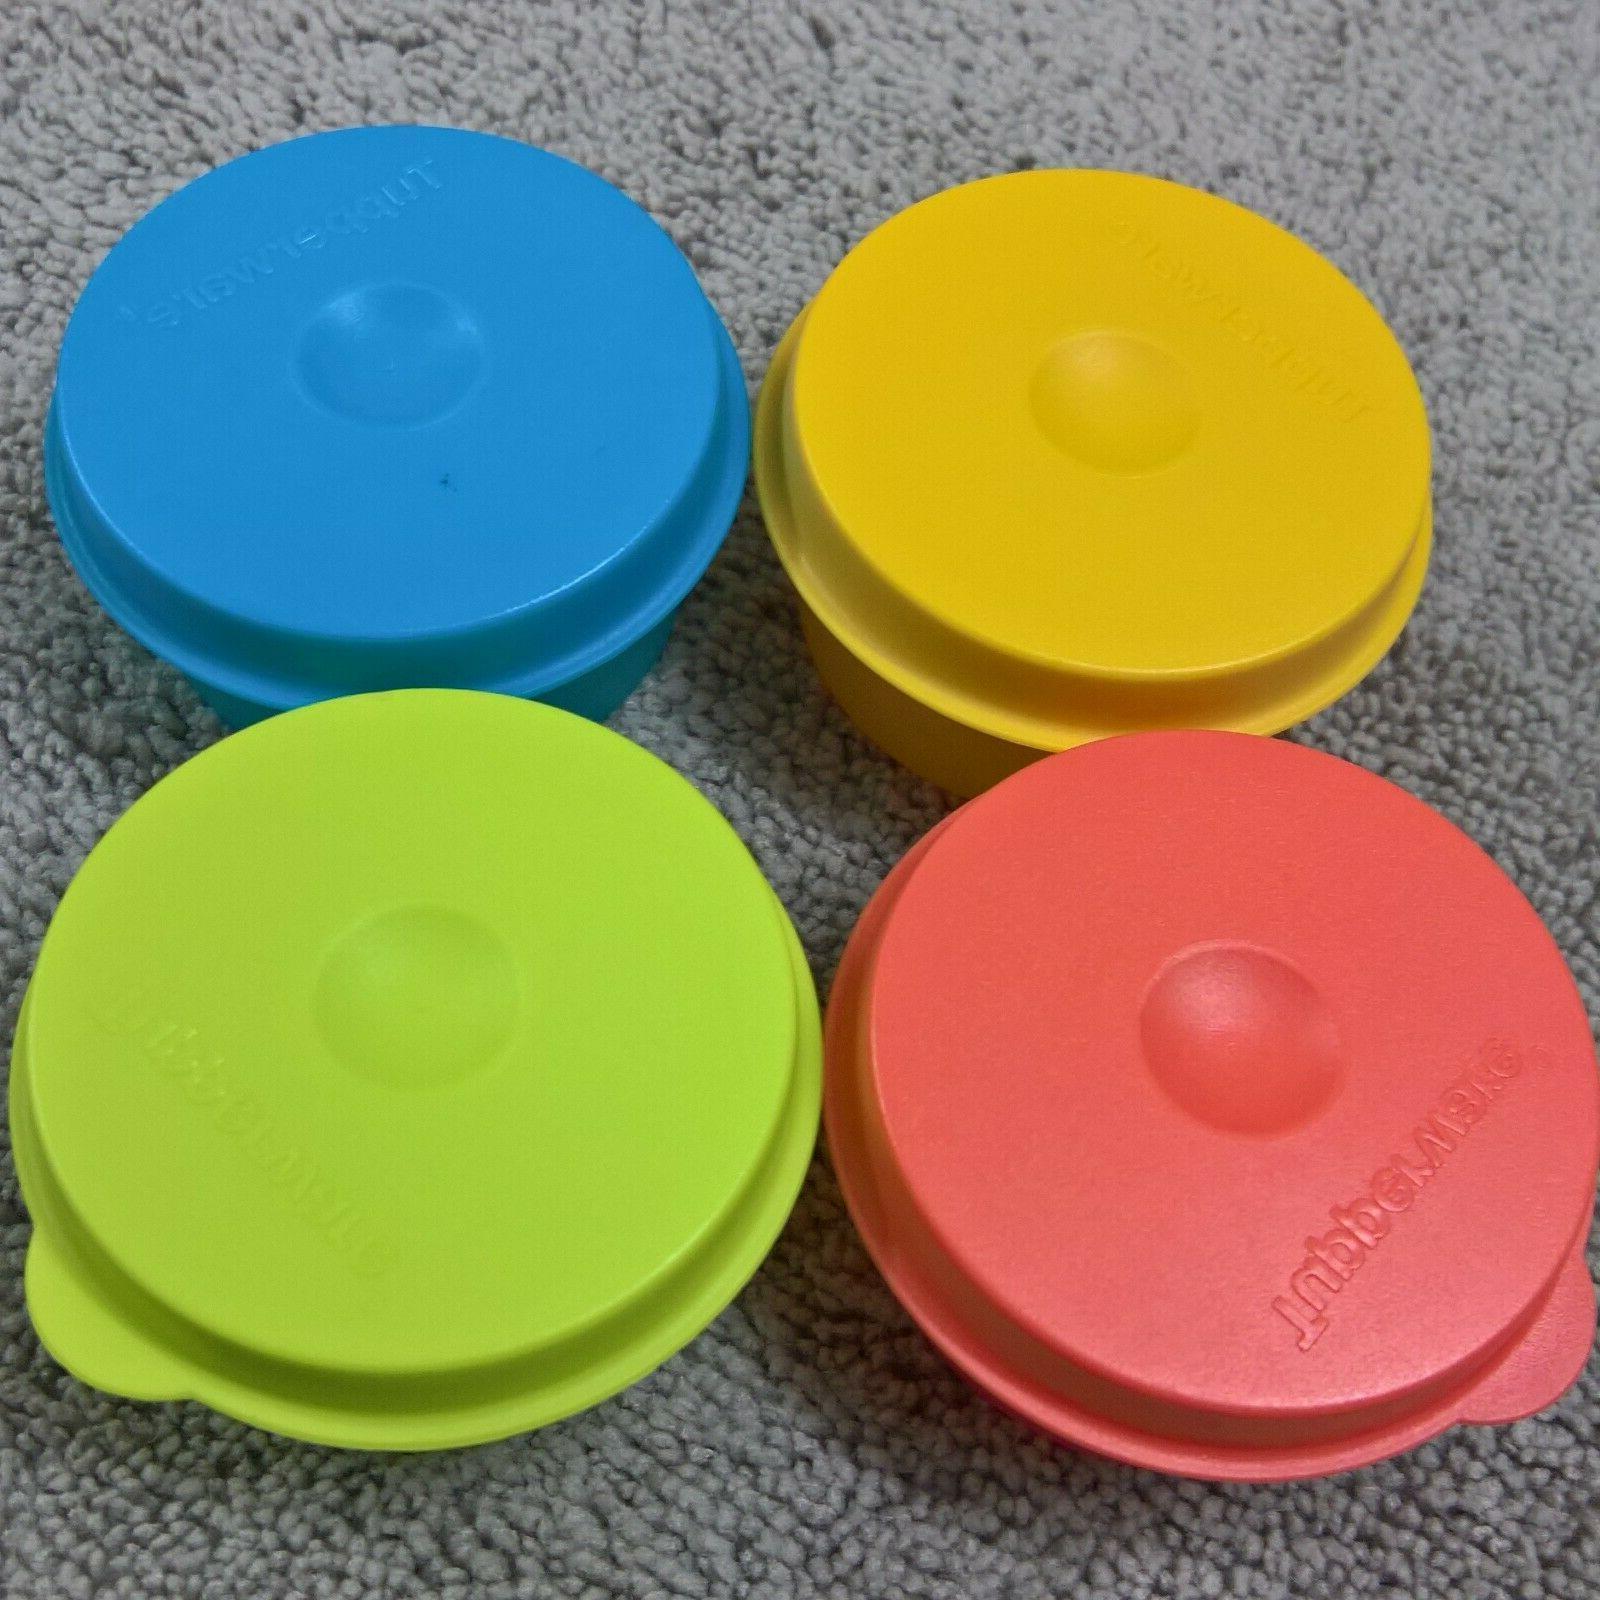 smidgets 30ml 4 colour minature storage containers